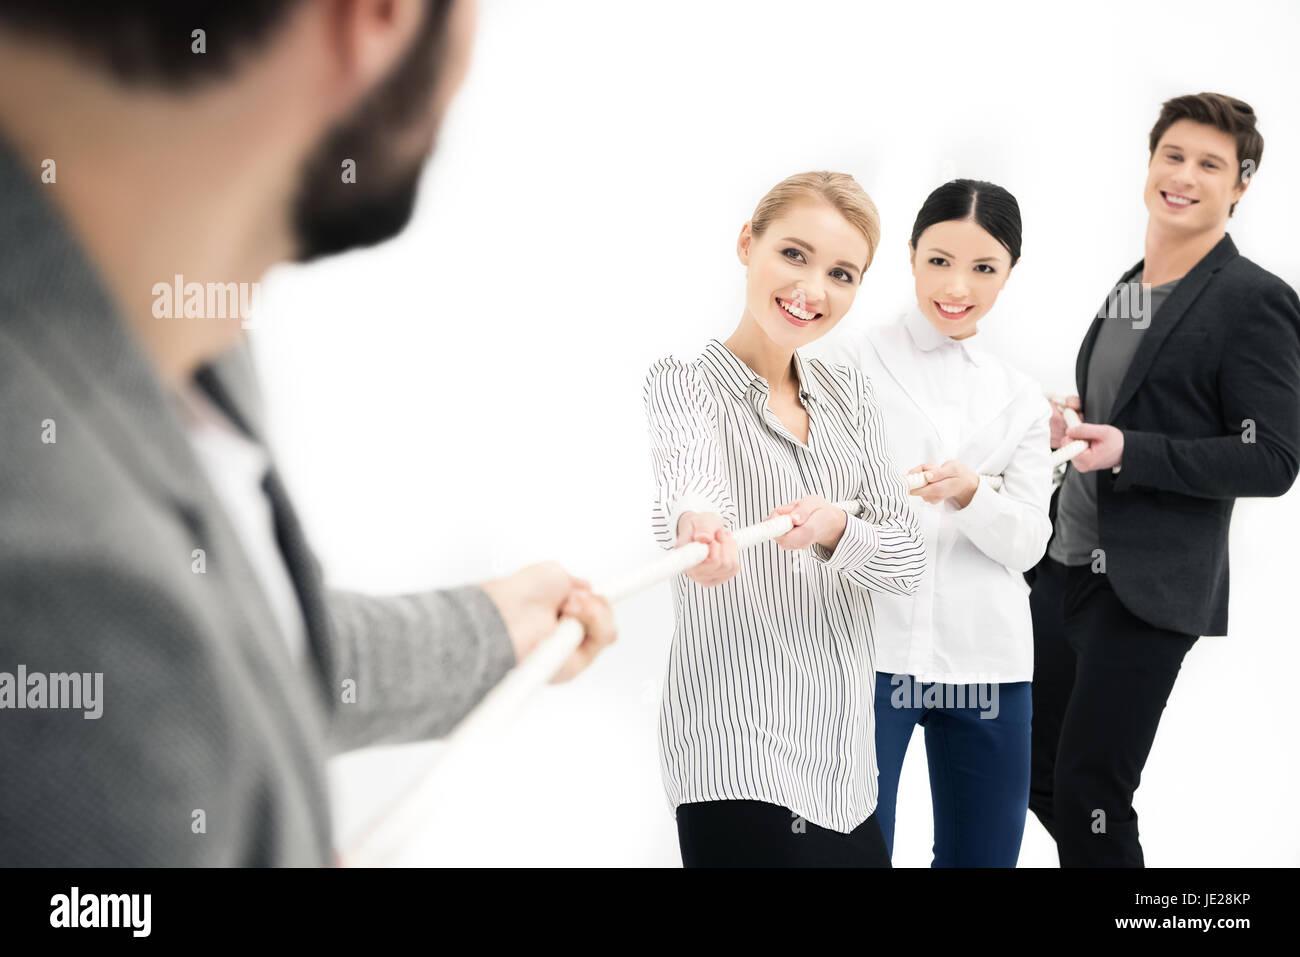 Groupe de gens d'affaires tirant plus de corde isolated on white Photo Stock